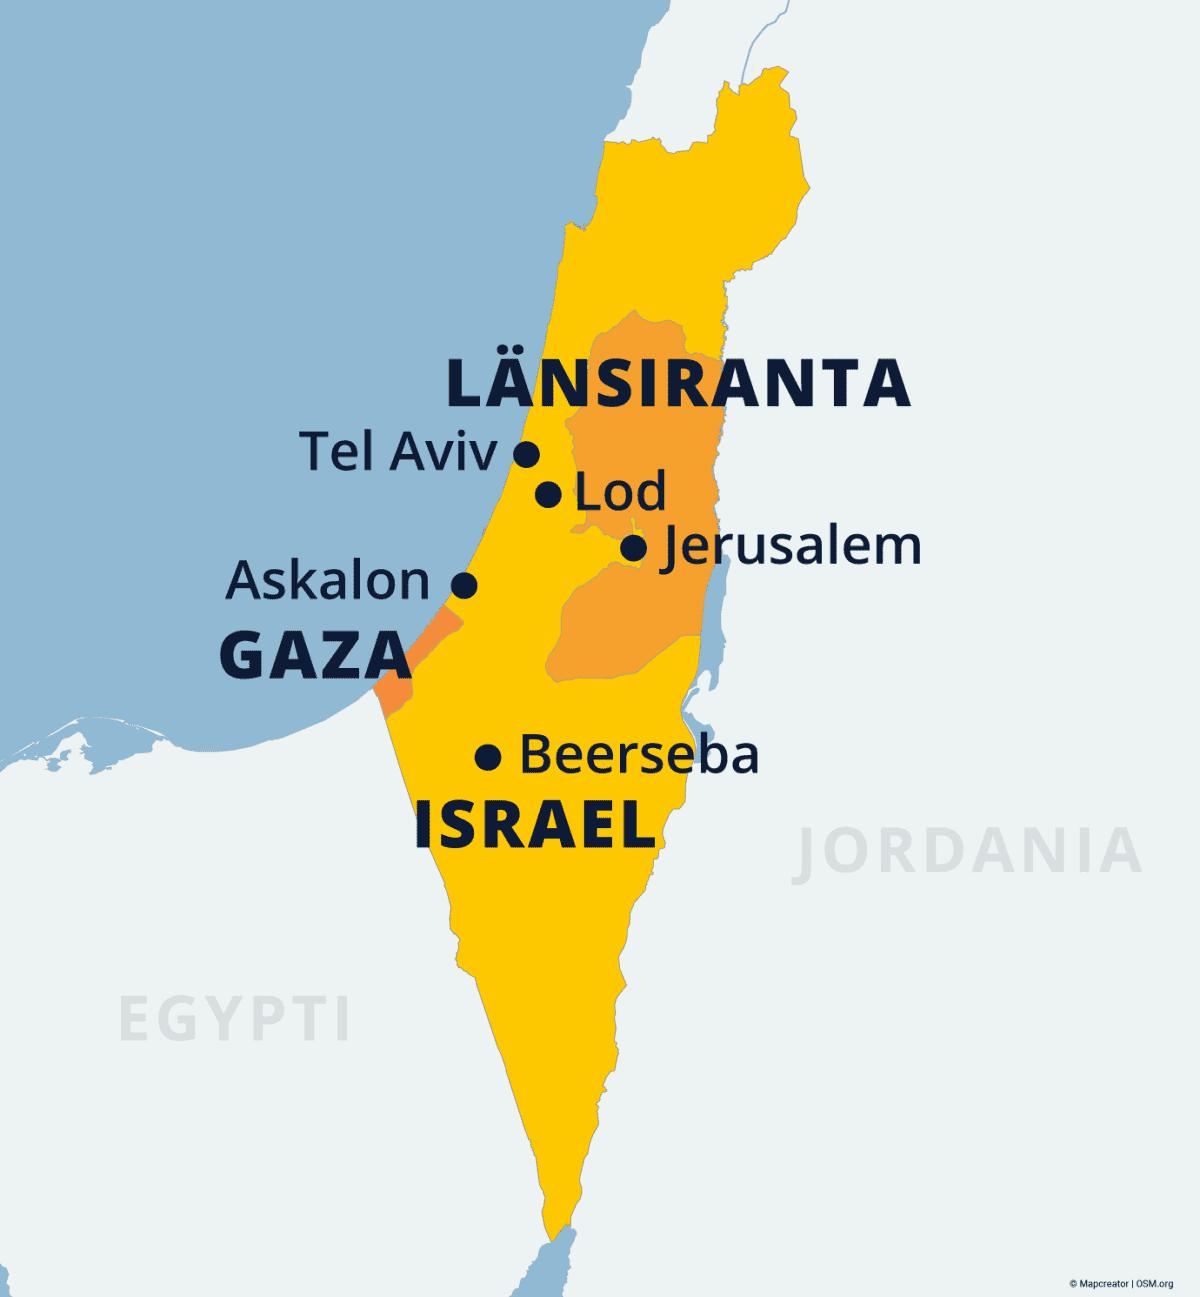 Kartalla Israel, Gaza ja Länsiranta